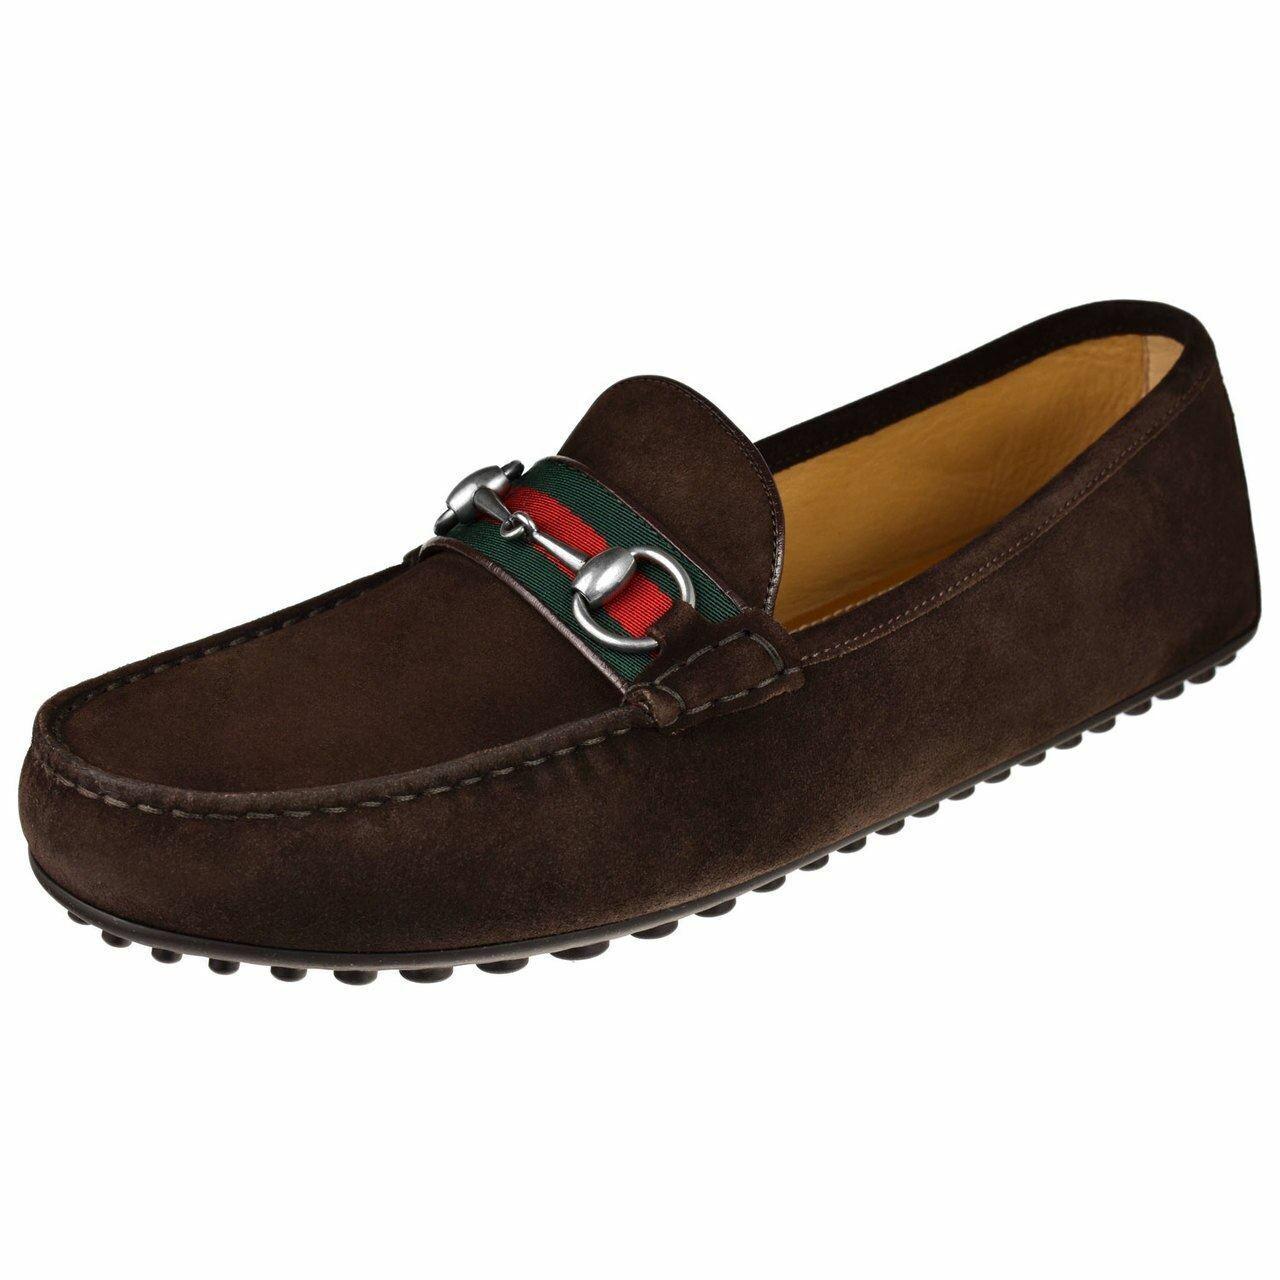 Gucci Mens Shoes Kanye Ribbon Bit Driver 450892-Cma40-2152